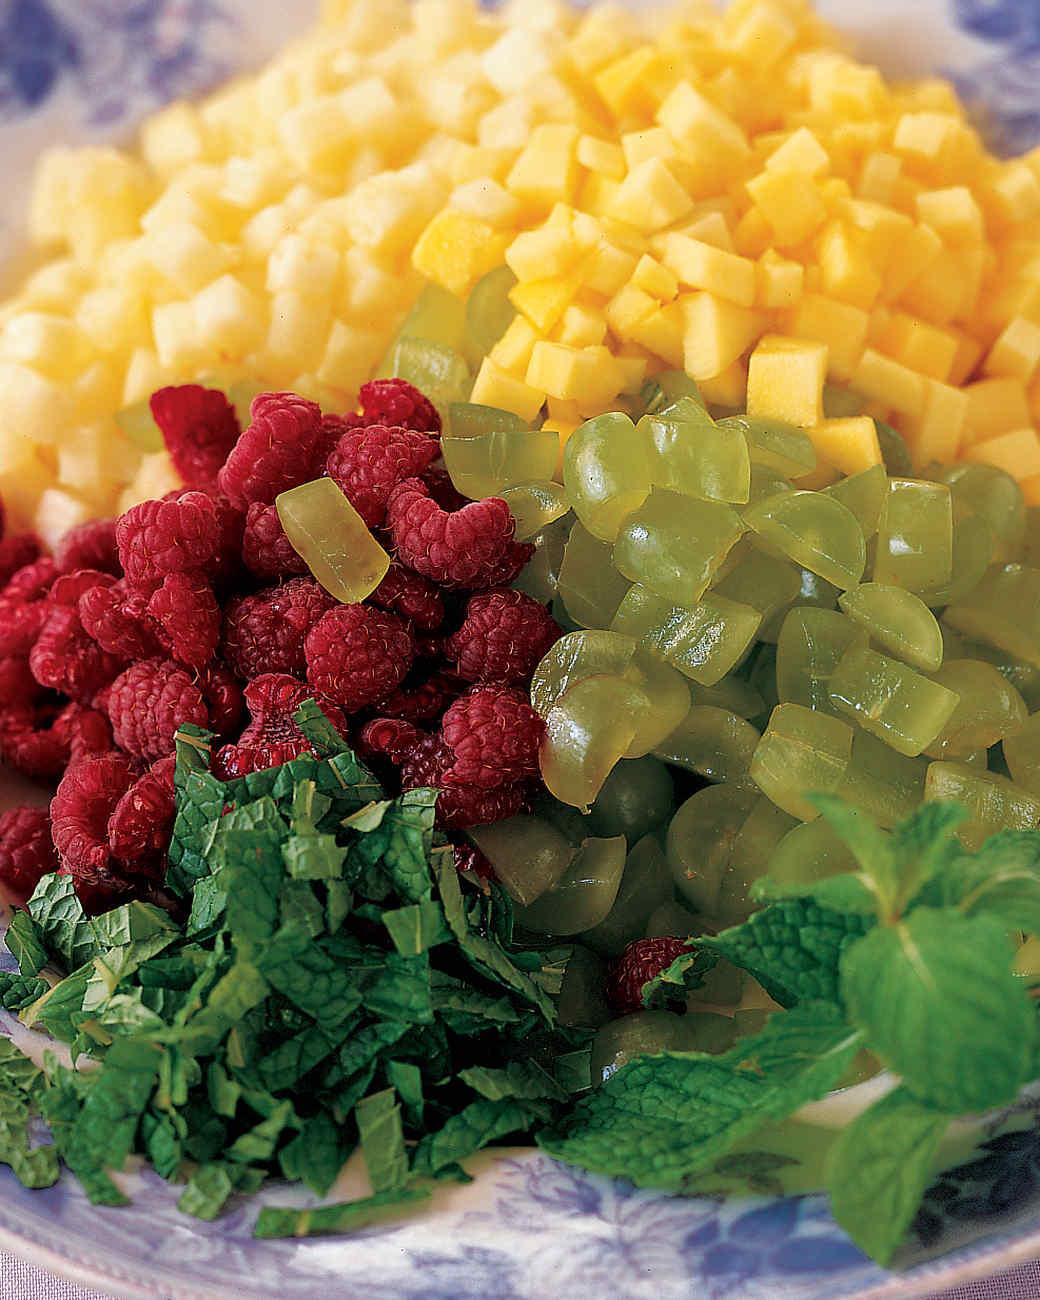 qc_0598_fruit.jpg